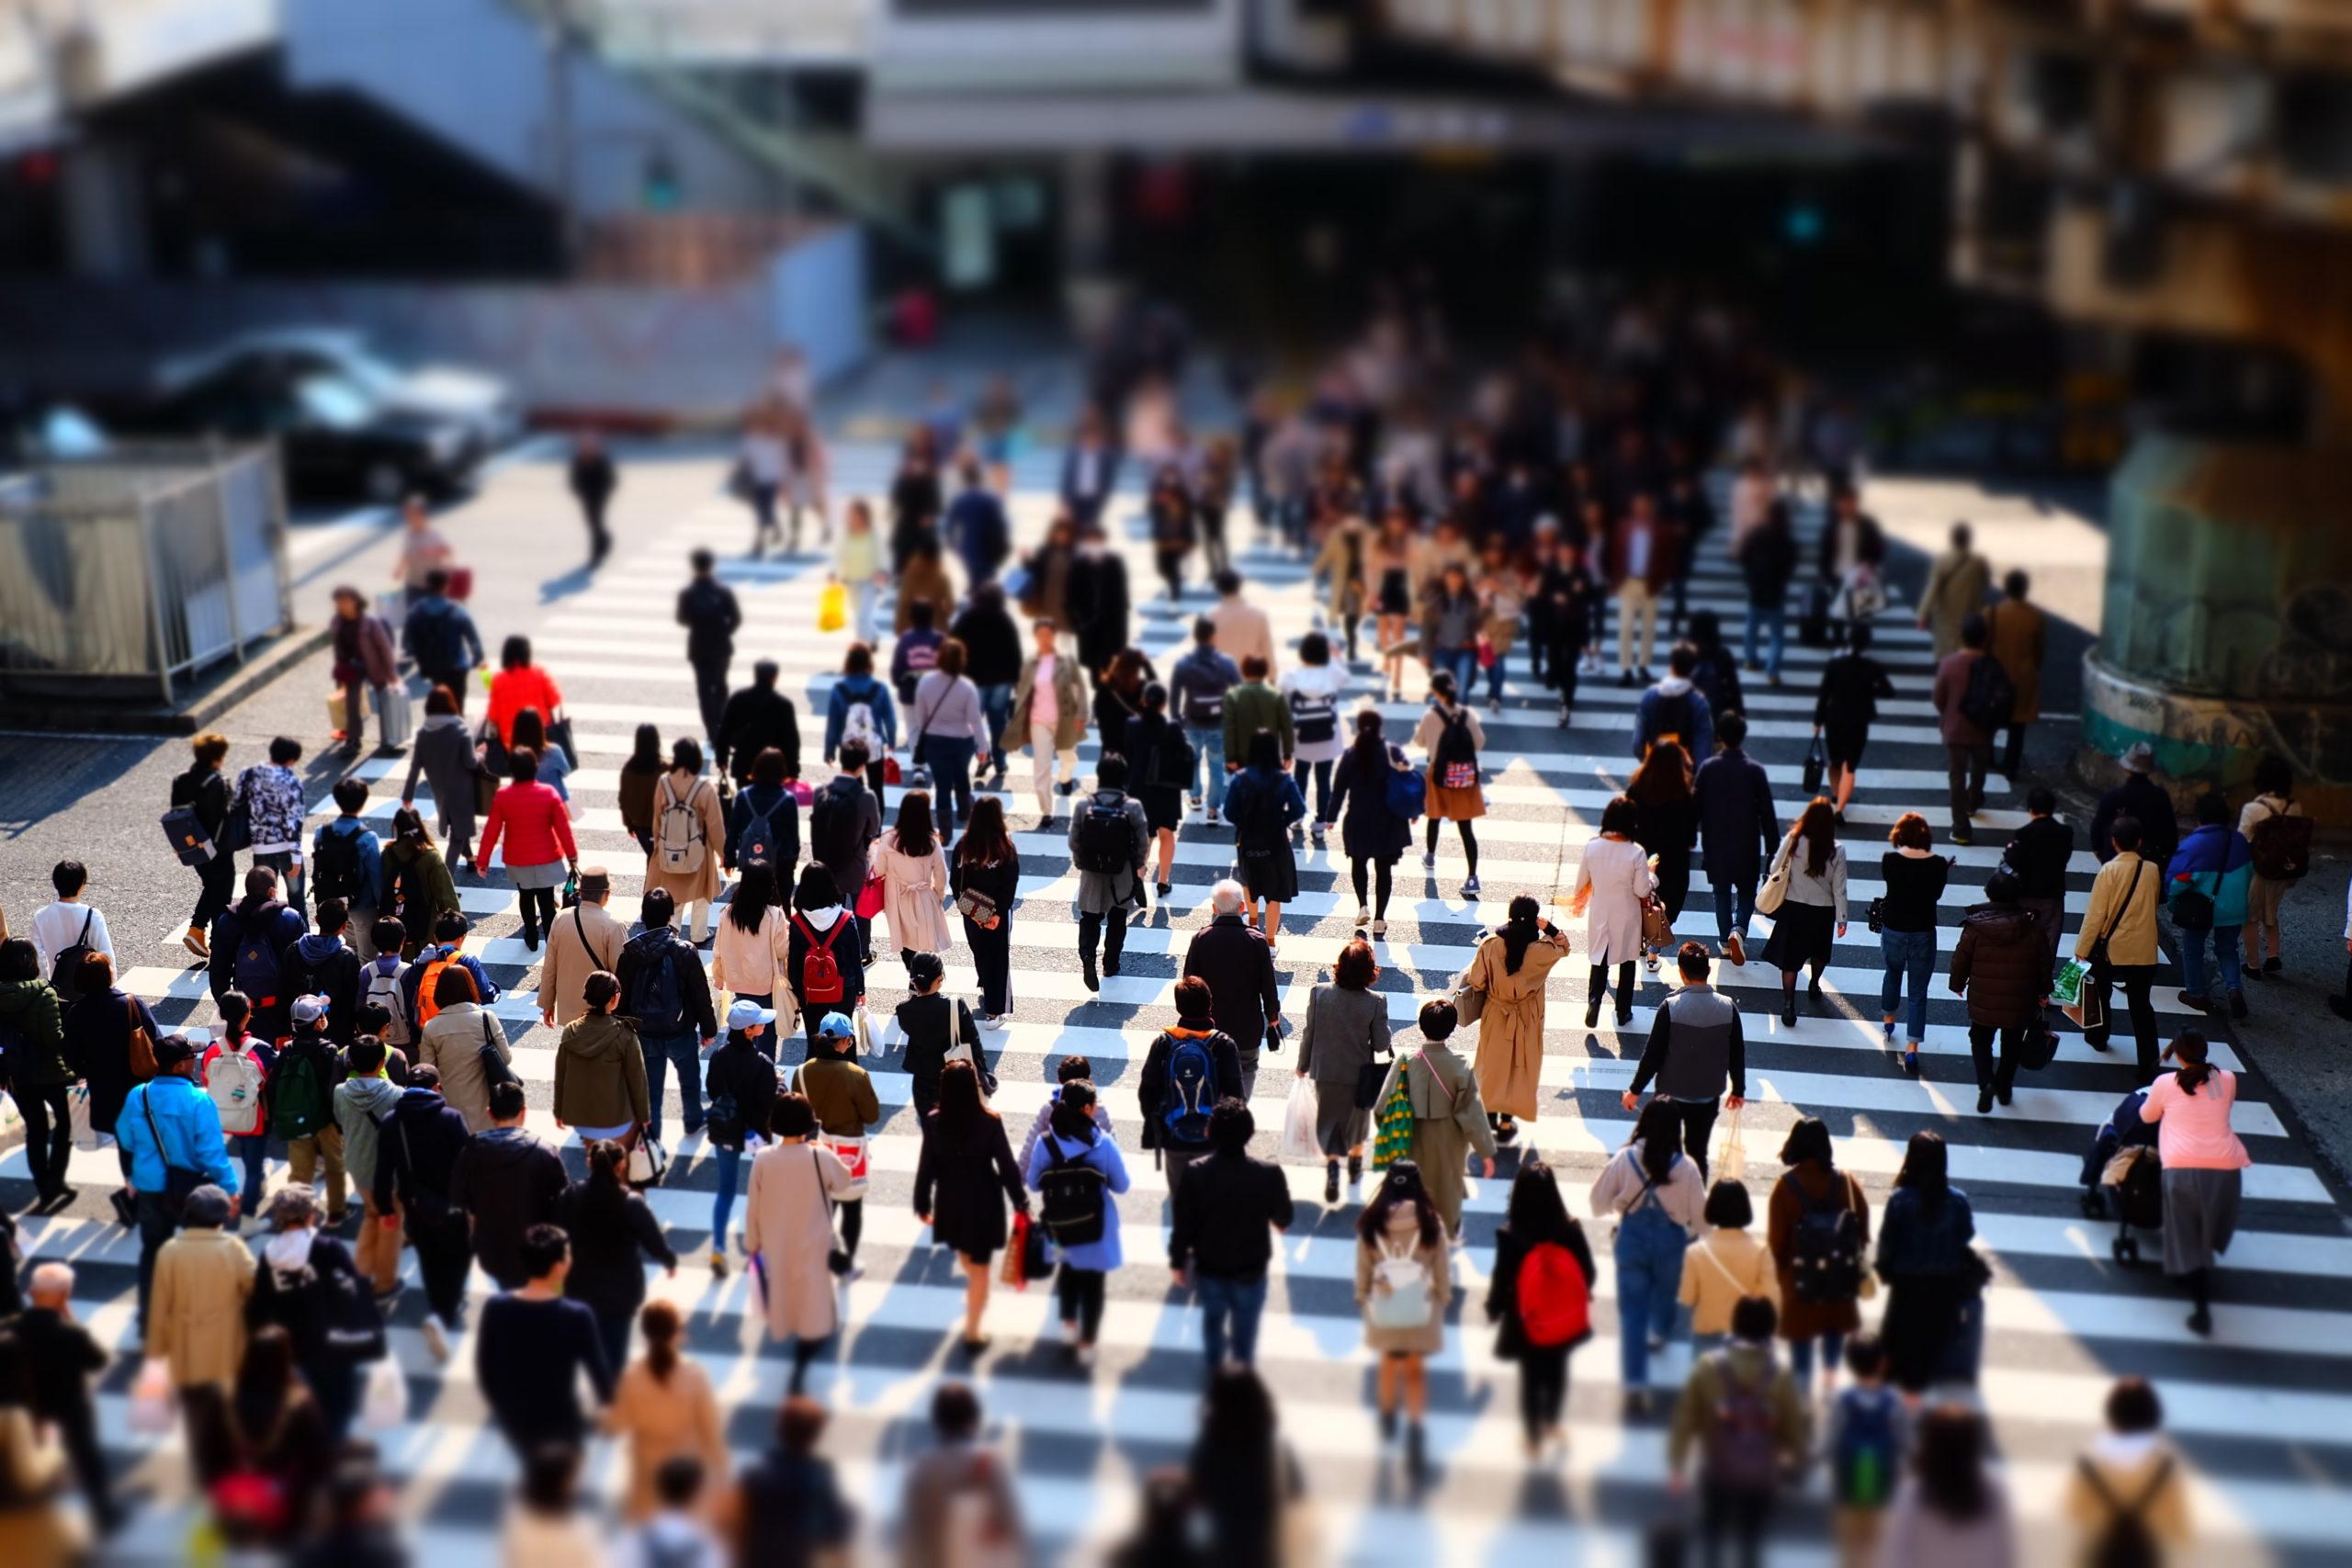 People walking on the street